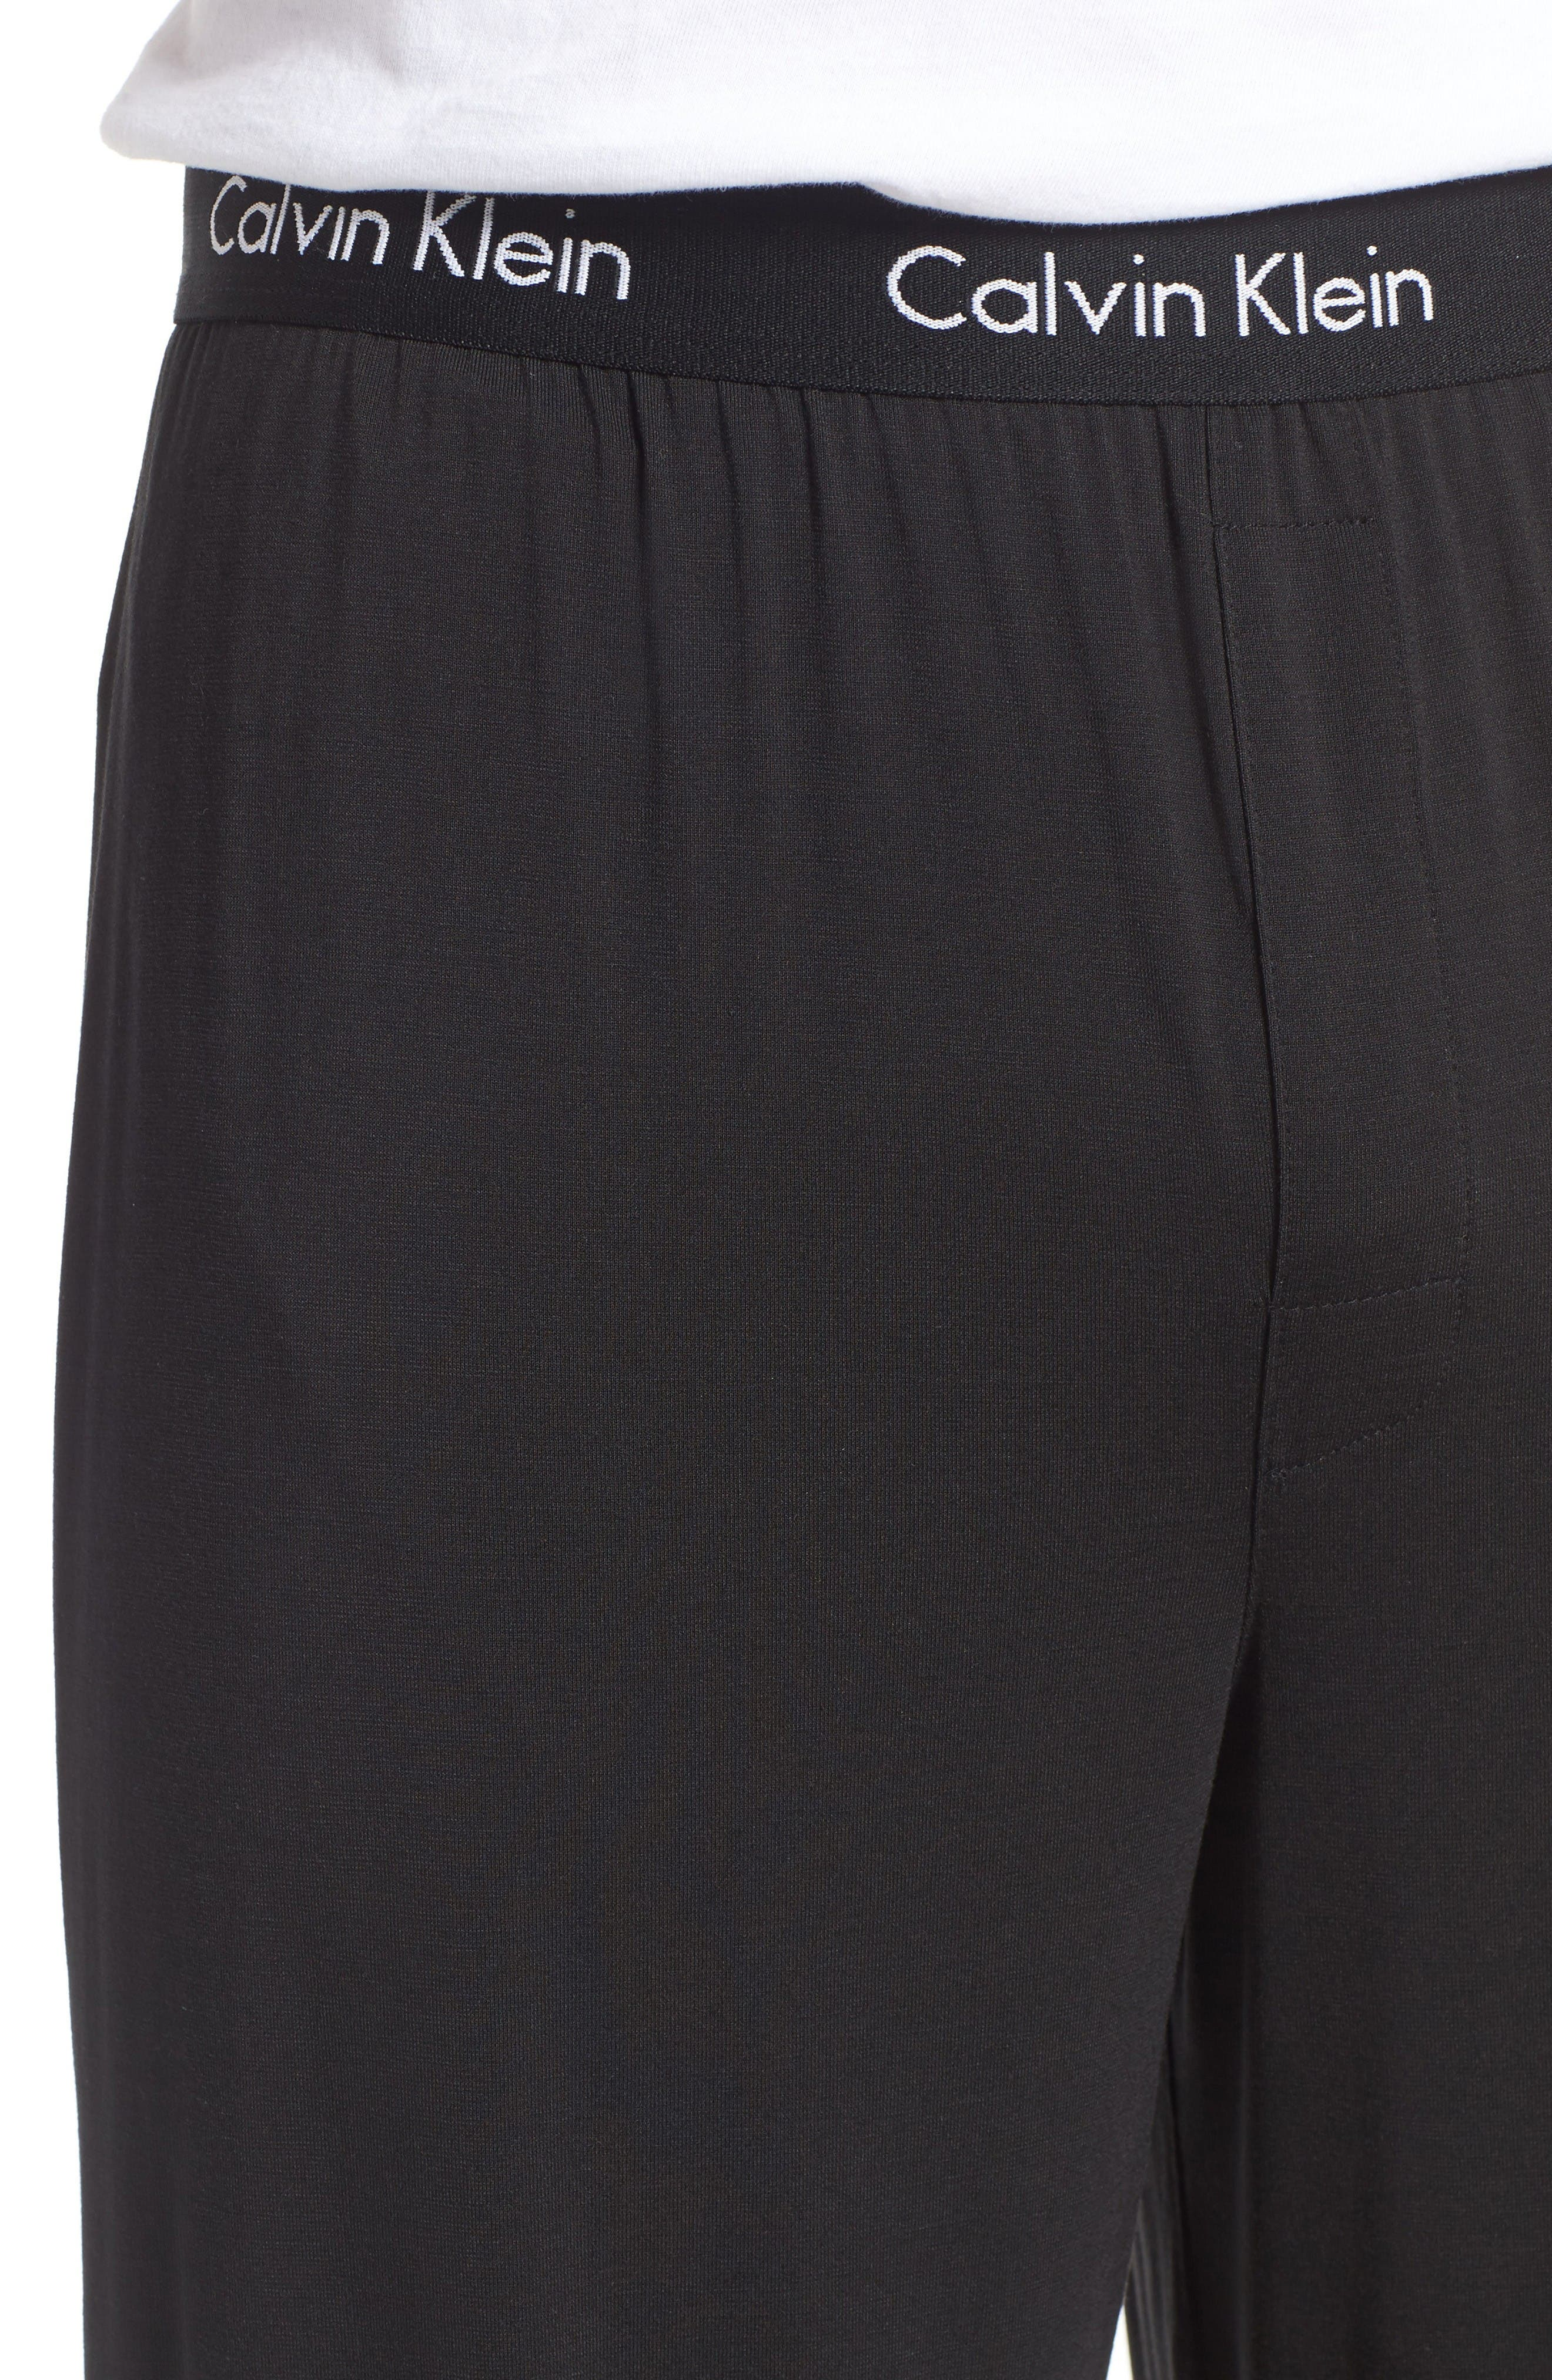 'U1143' Micromodal Lounge Pants,                             Alternate thumbnail 4, color,                             Black